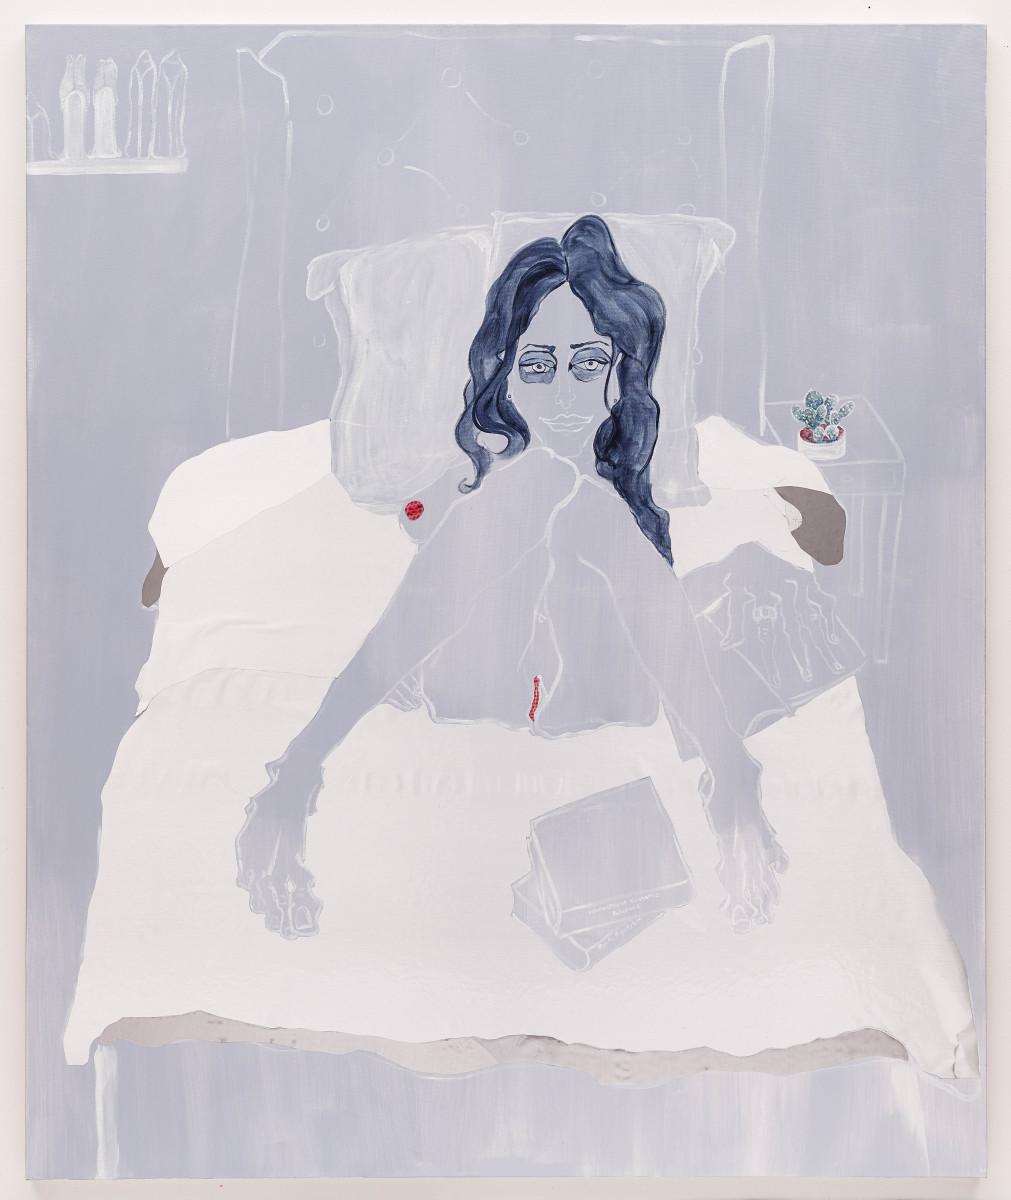 Sarah by Mel Reese